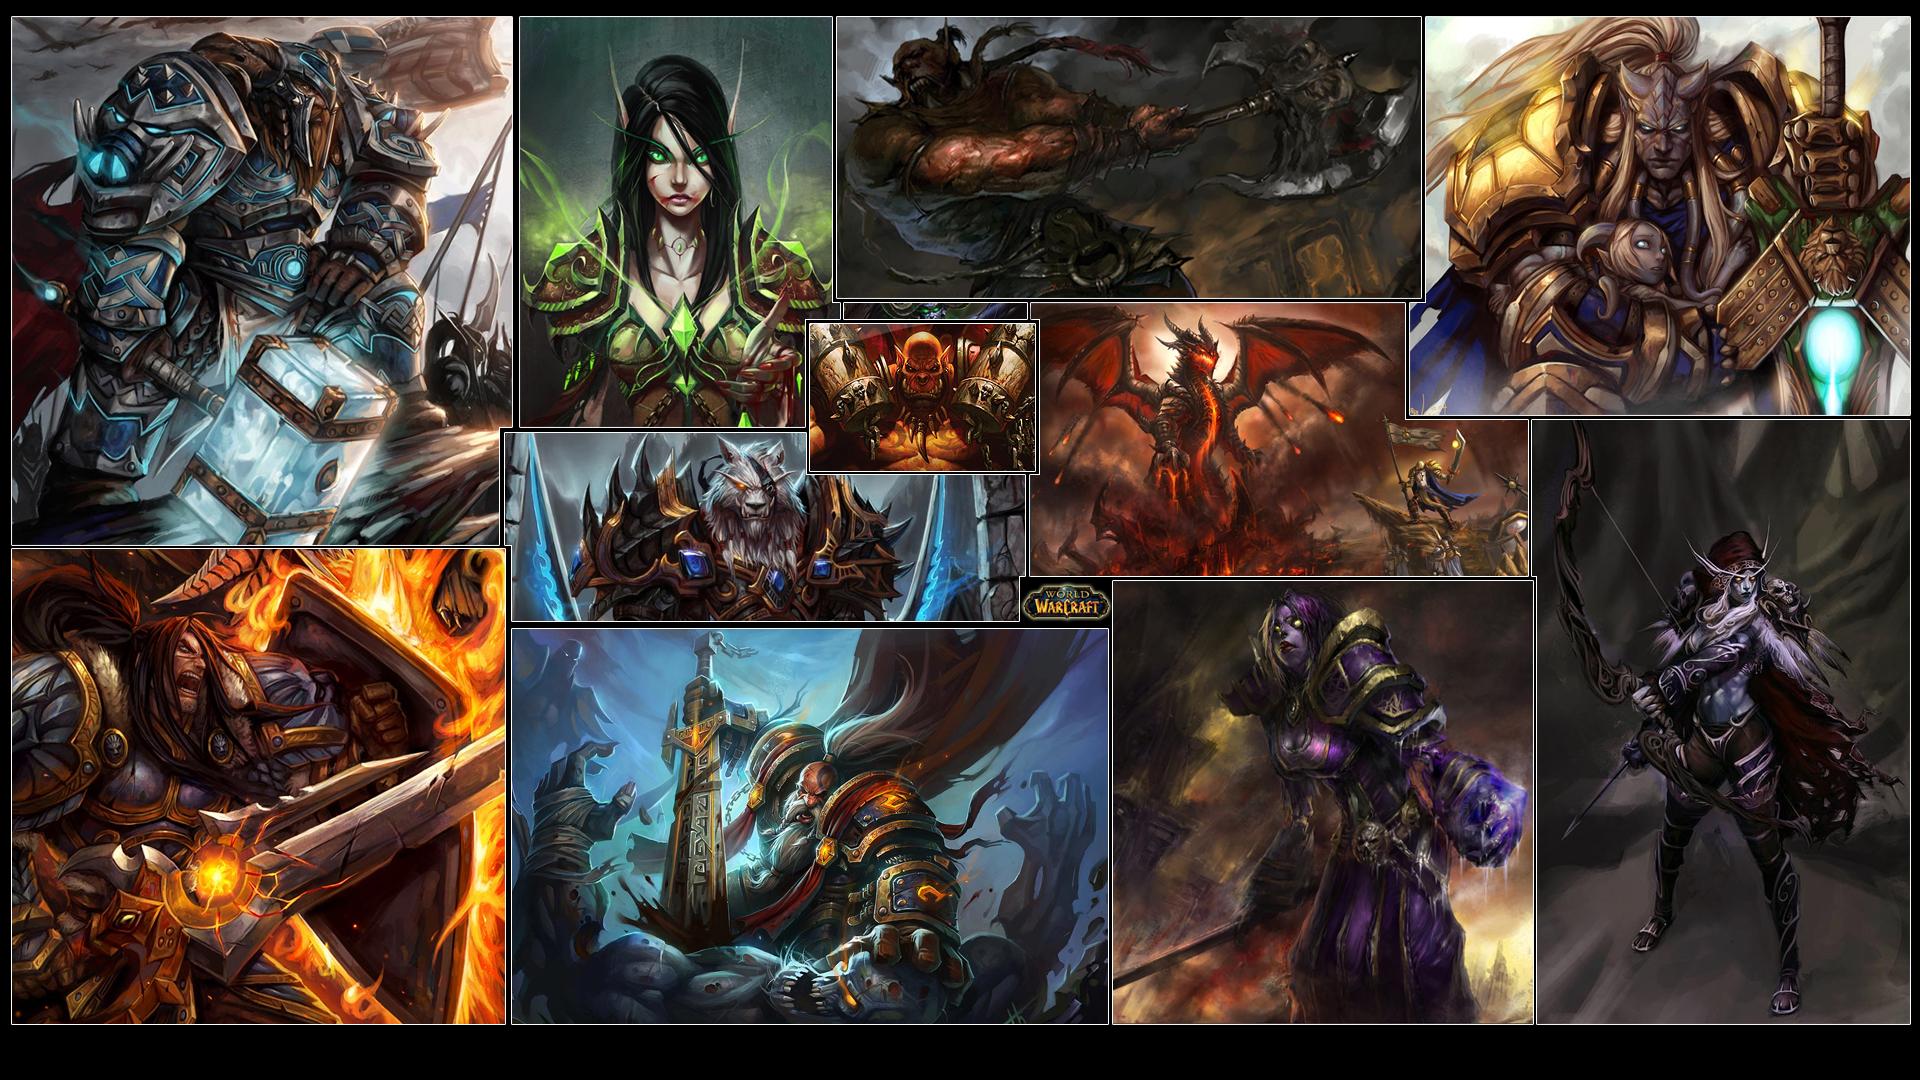 world_of_warcraft_wallpaper_by_gt_orphan-d467si0.jpg